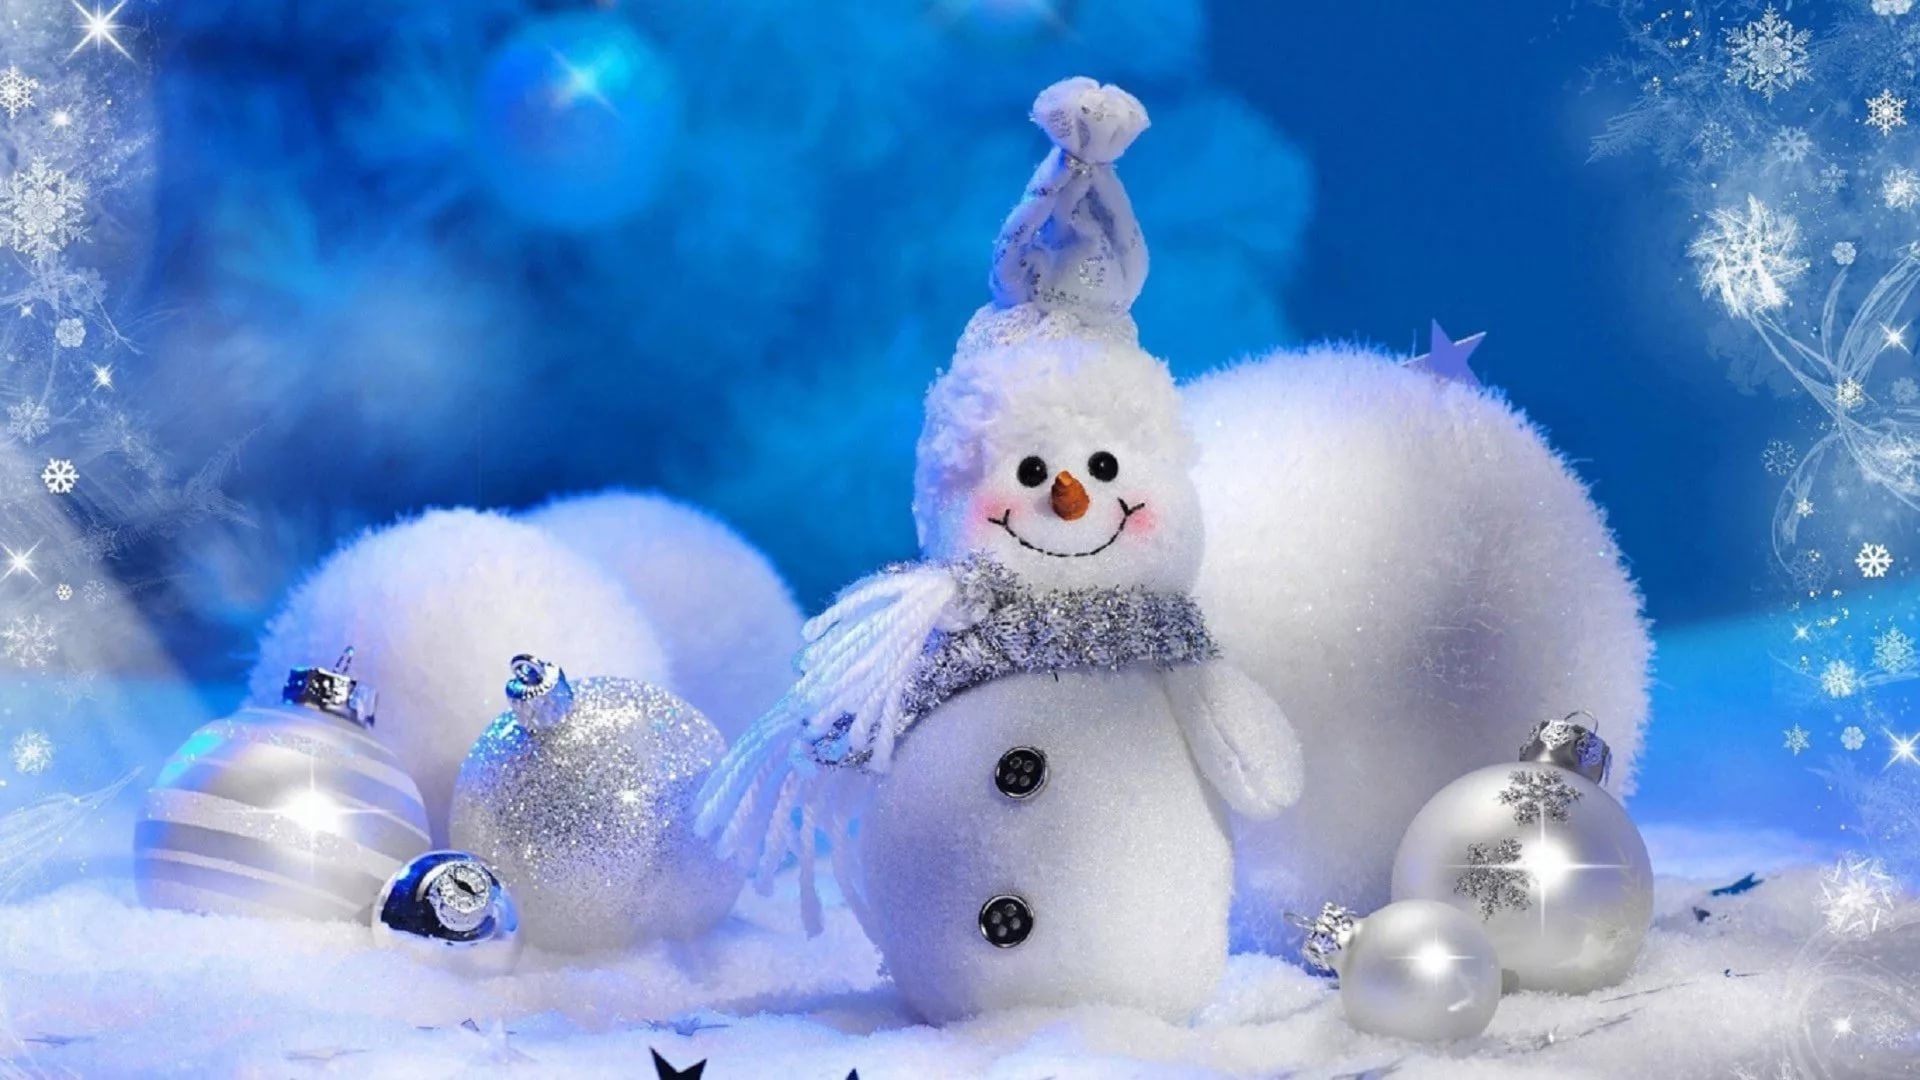 Happy Winter laptop wallpaper